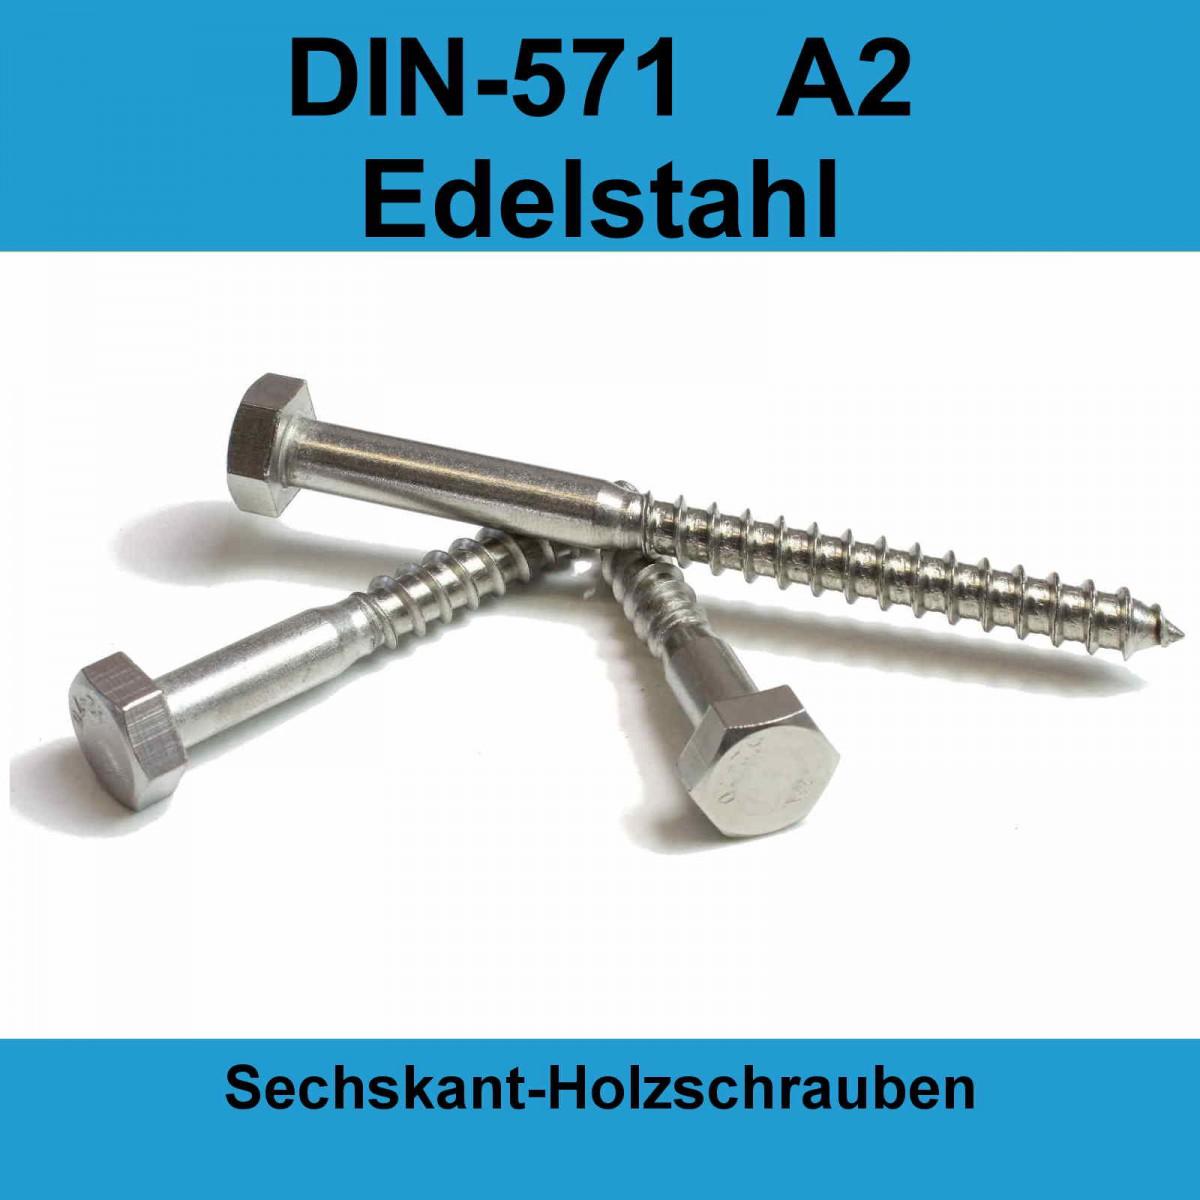 Wundervoll M10 DIN 571 Holzschrauben A2 Edelstahl Sechskant  ZK26